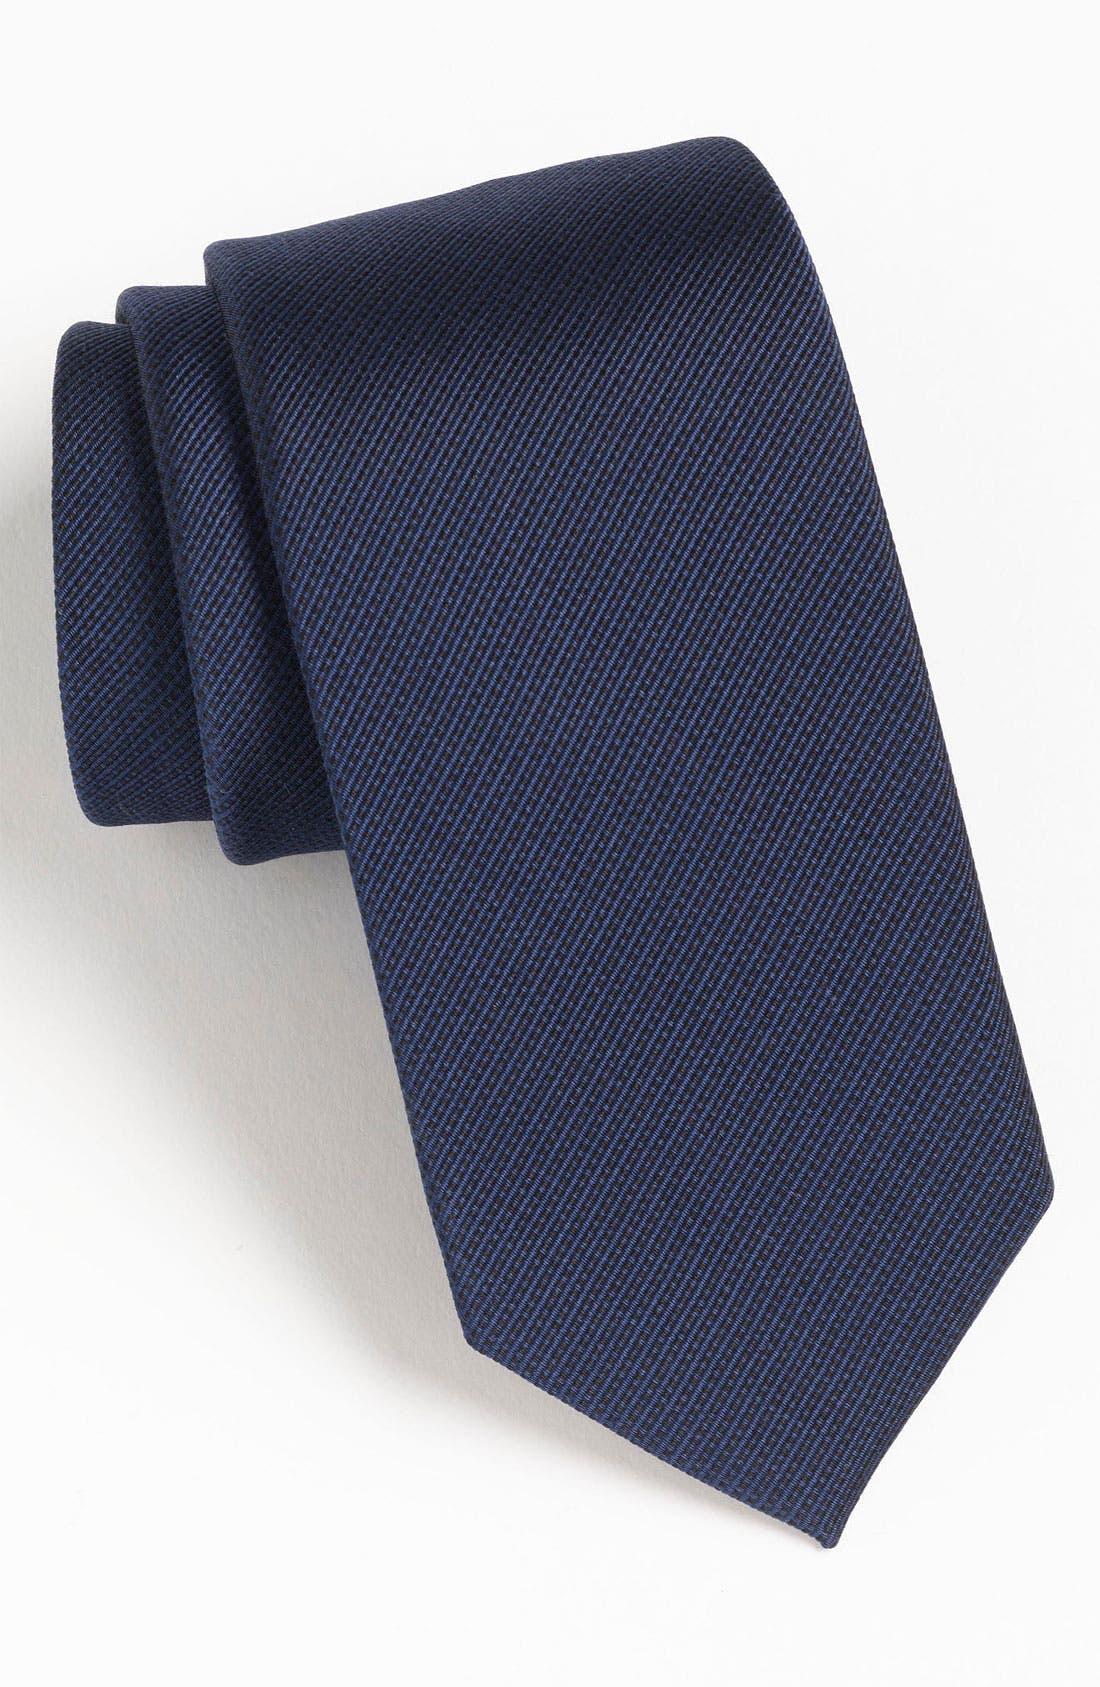 Main Image - The Rail Silk Woven Tie